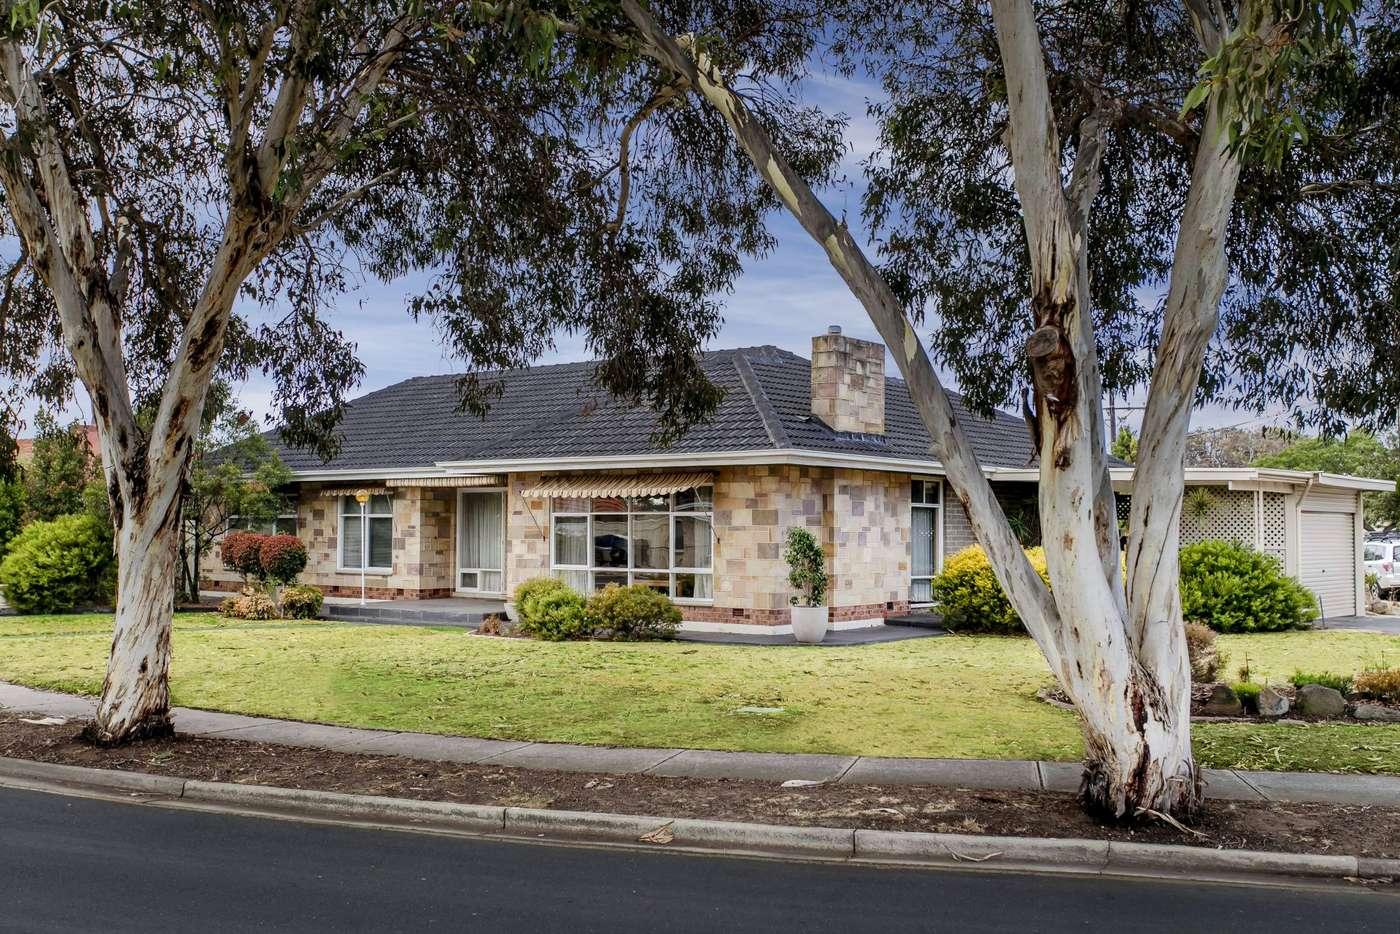 Main view of Homely house listing, 1 Raffles Crescent, Plympton SA 5038